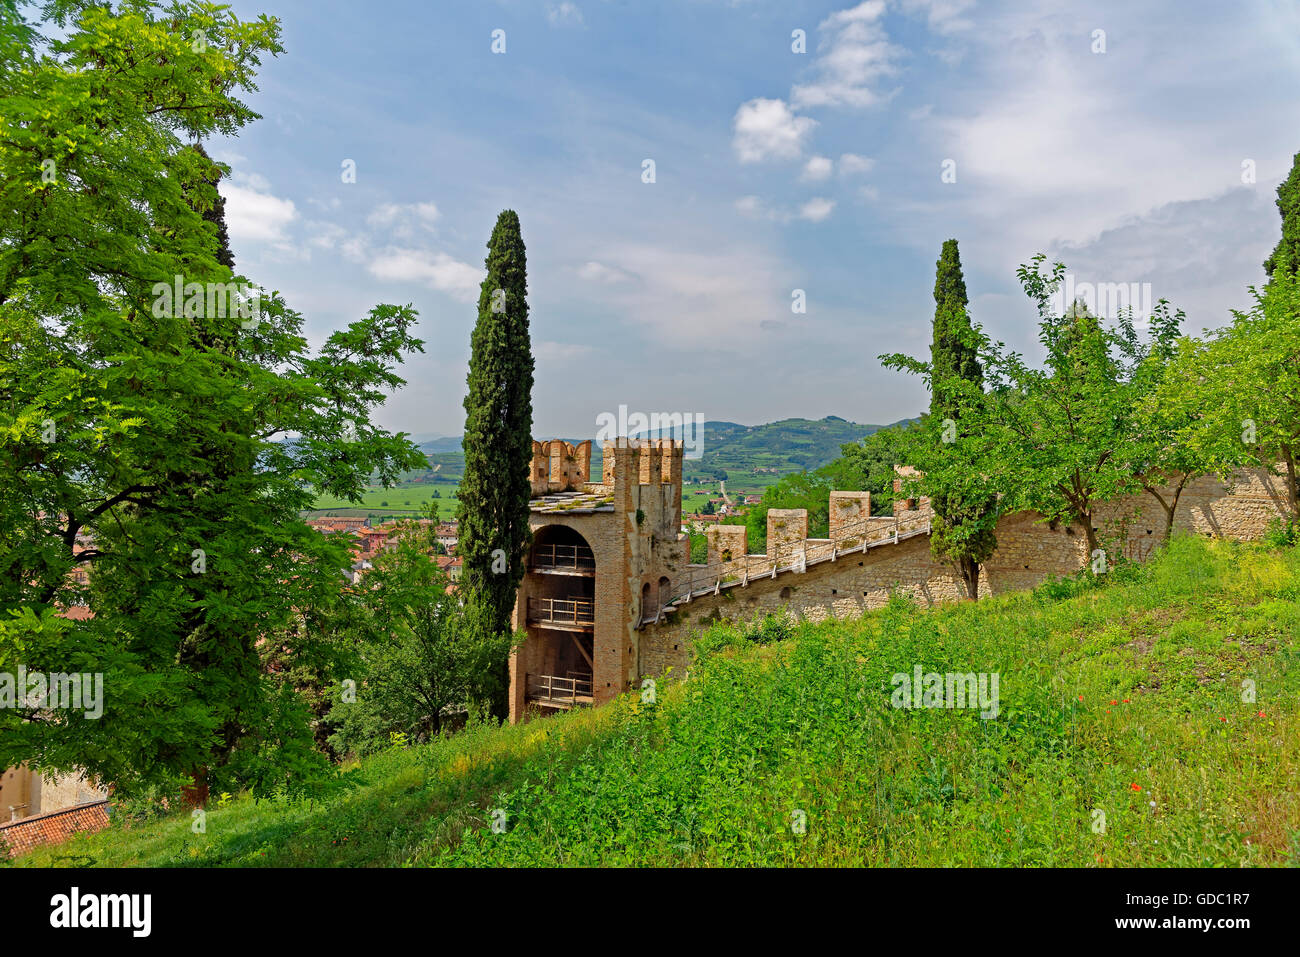 Scalierburg,Castello Medievale,tower,rook,wall Stock Photo